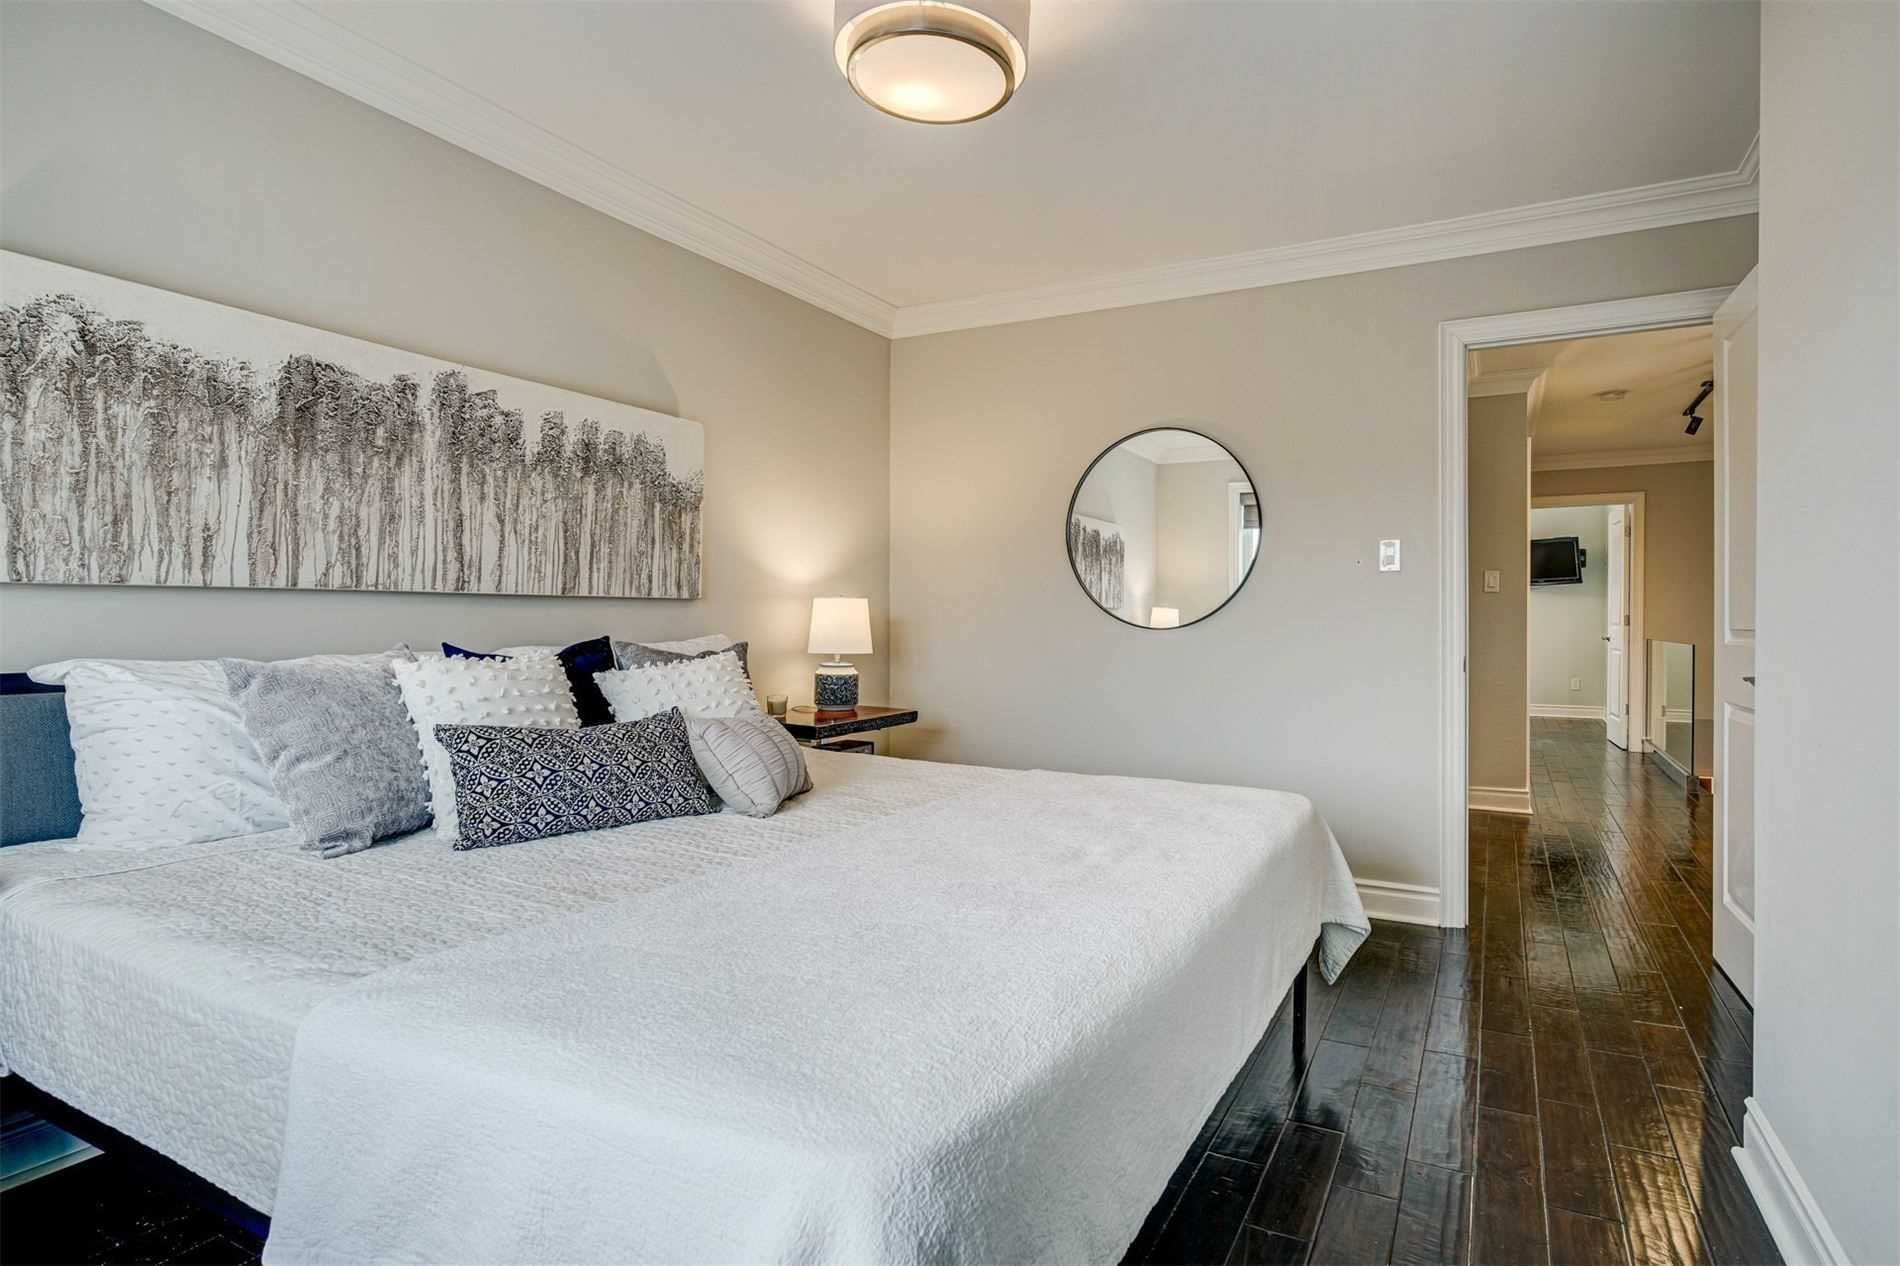 Photo 18: Photos: 92 Holborne Avenue in Toronto: Danforth Village-East York House (2-Storey) for sale (Toronto E03)  : MLS®# E5204452